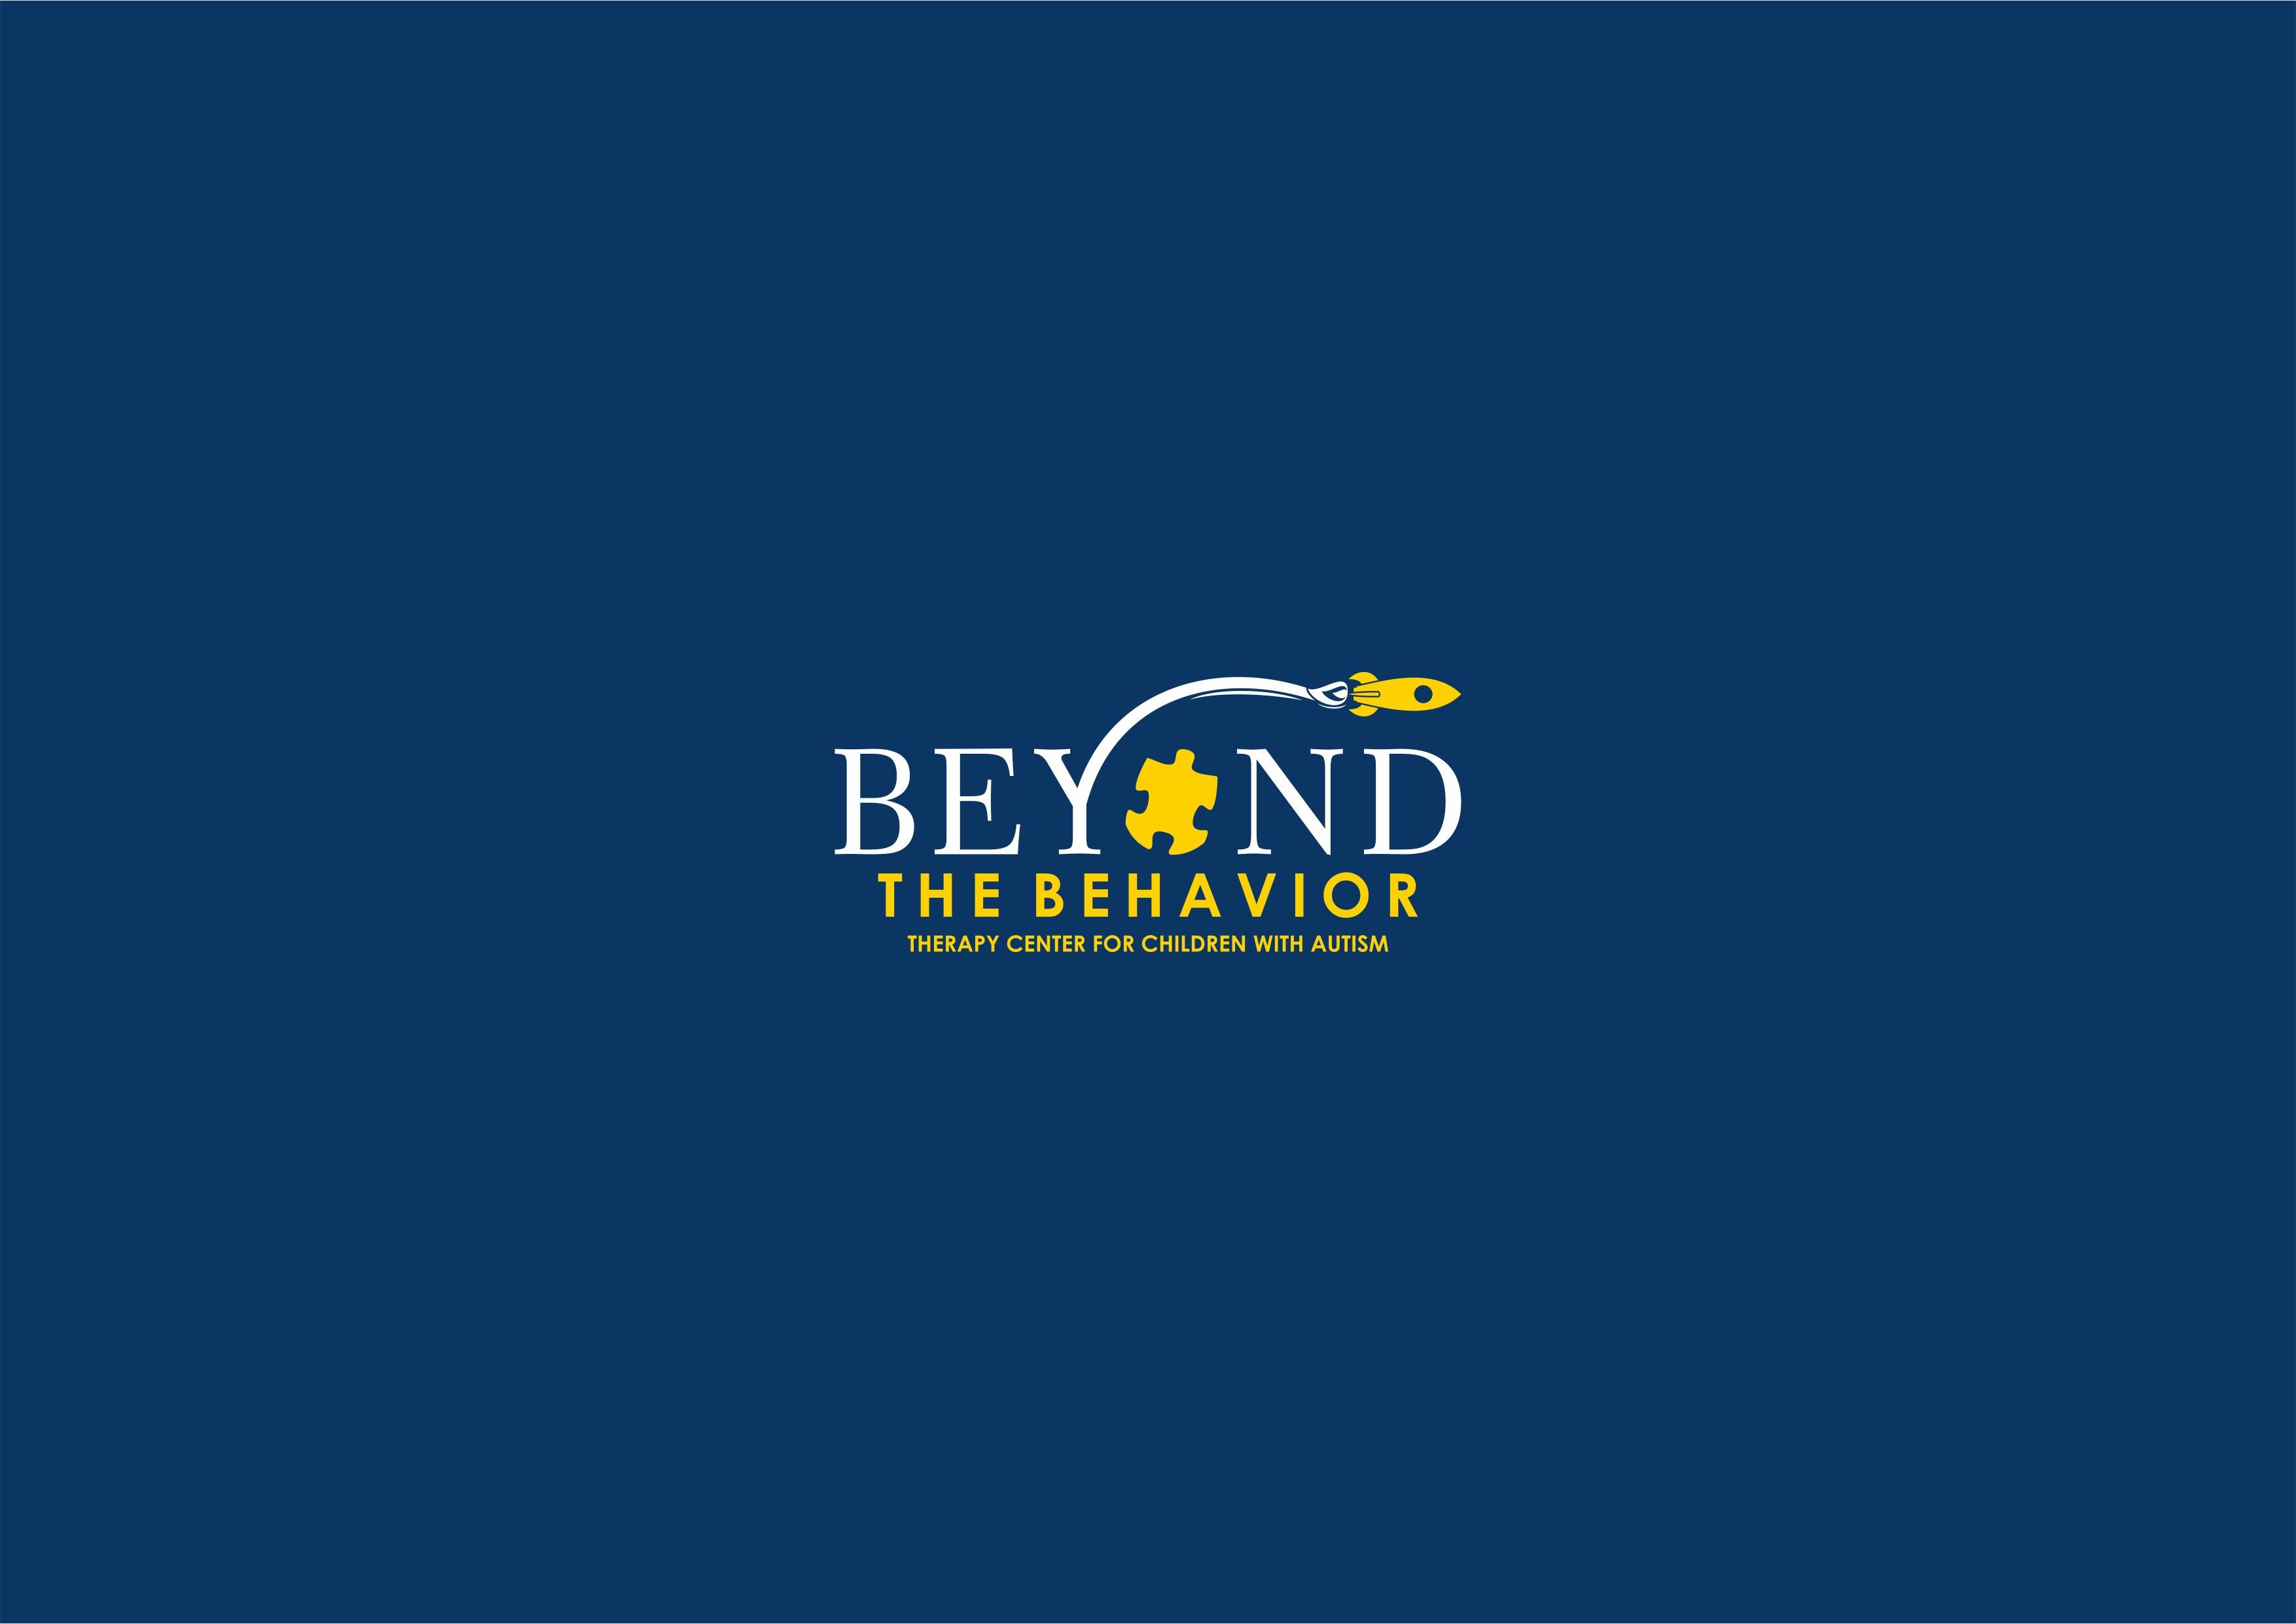 Create an original logo for Beyond the Behavior